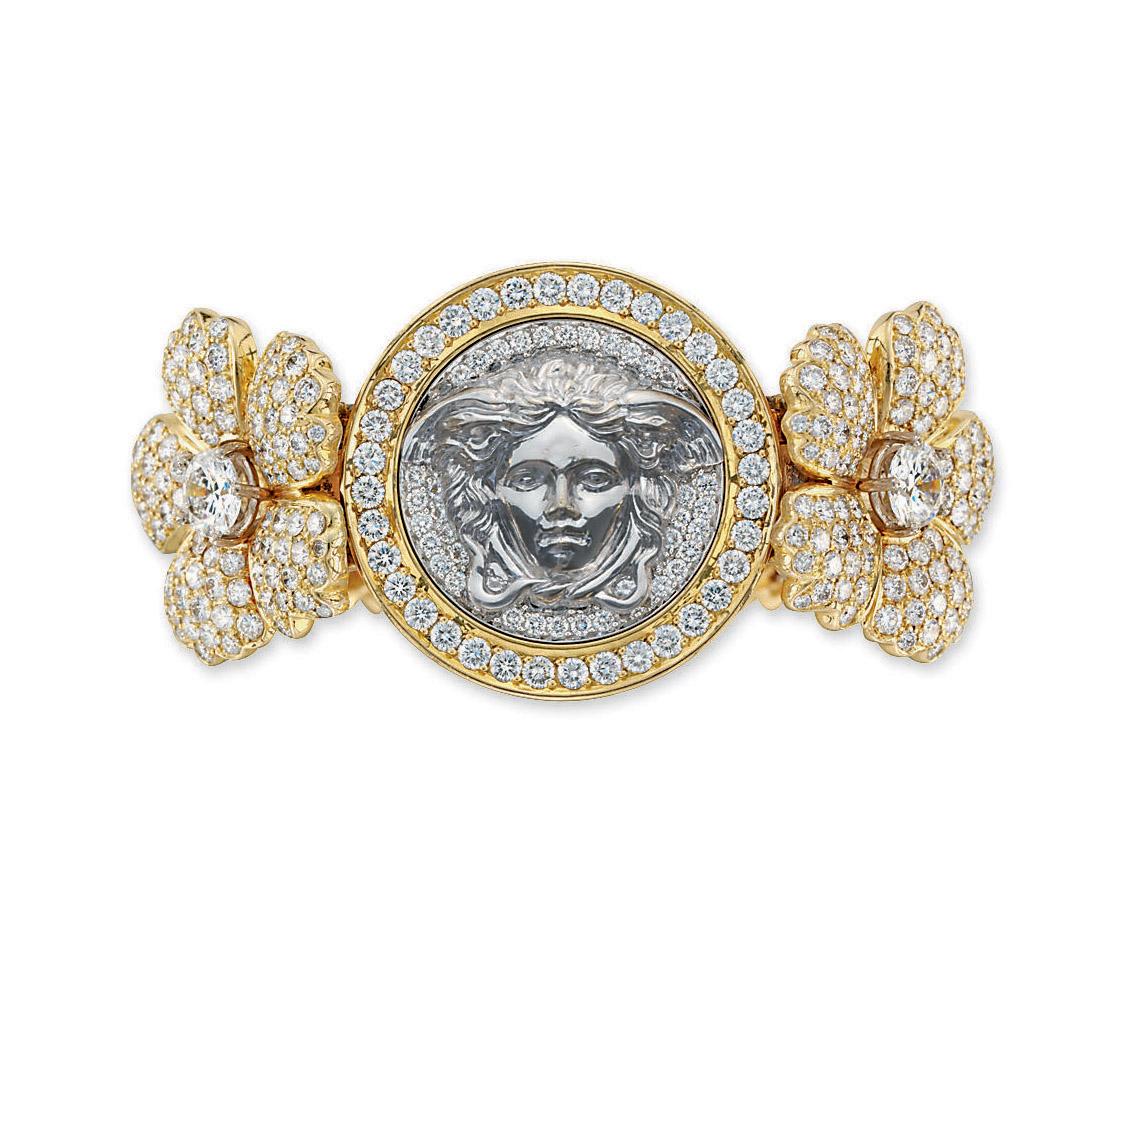 A DIAMOND CUFF, BY VERSACE